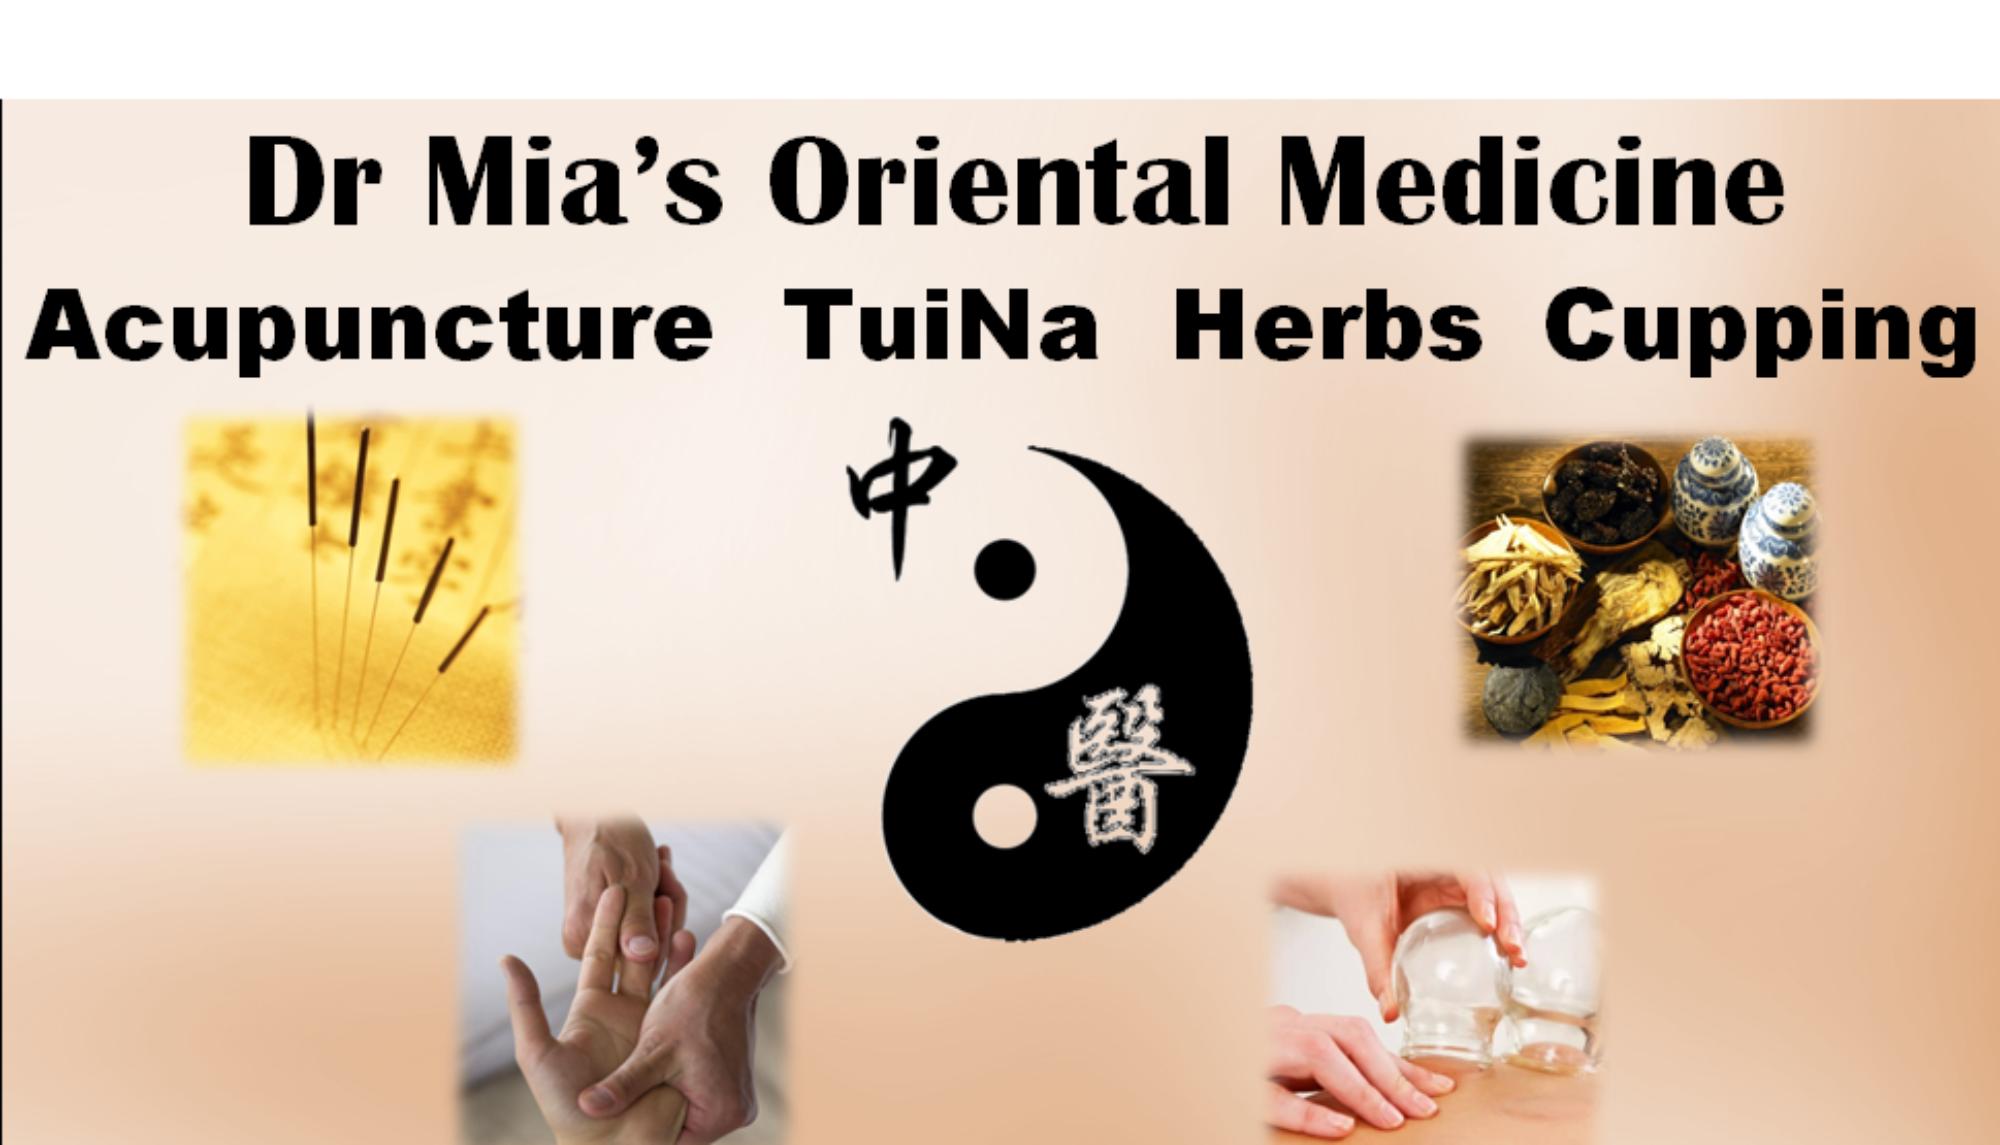 Dr Mia's Oriental Medicine